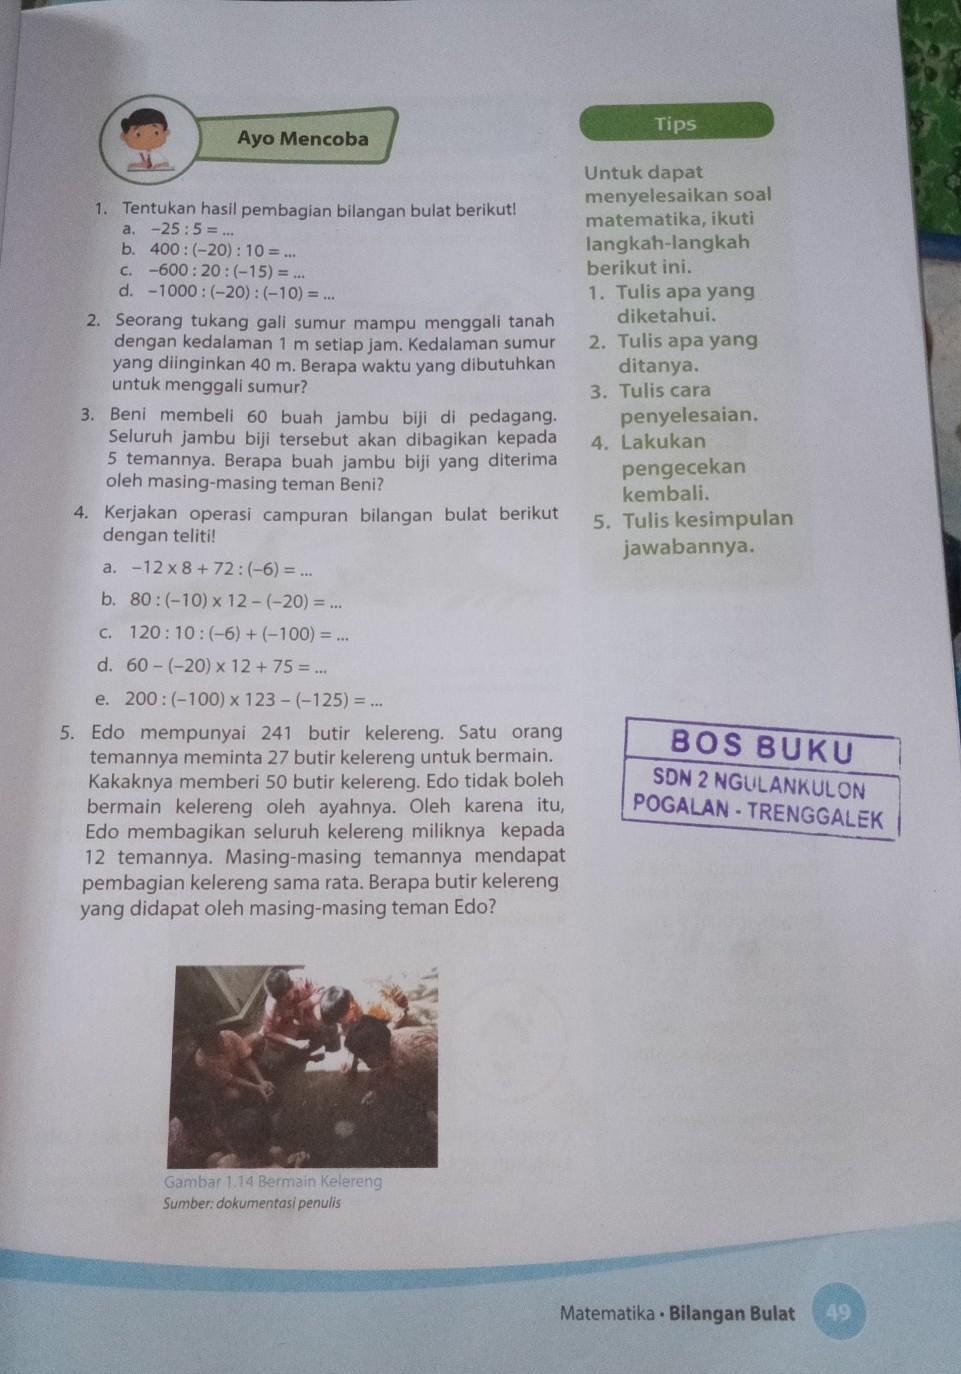 Tolong Dijawab 10 Poin Niikunci Jawaban Matematika Kelas 6 Halaman 49 Brainly Co Id